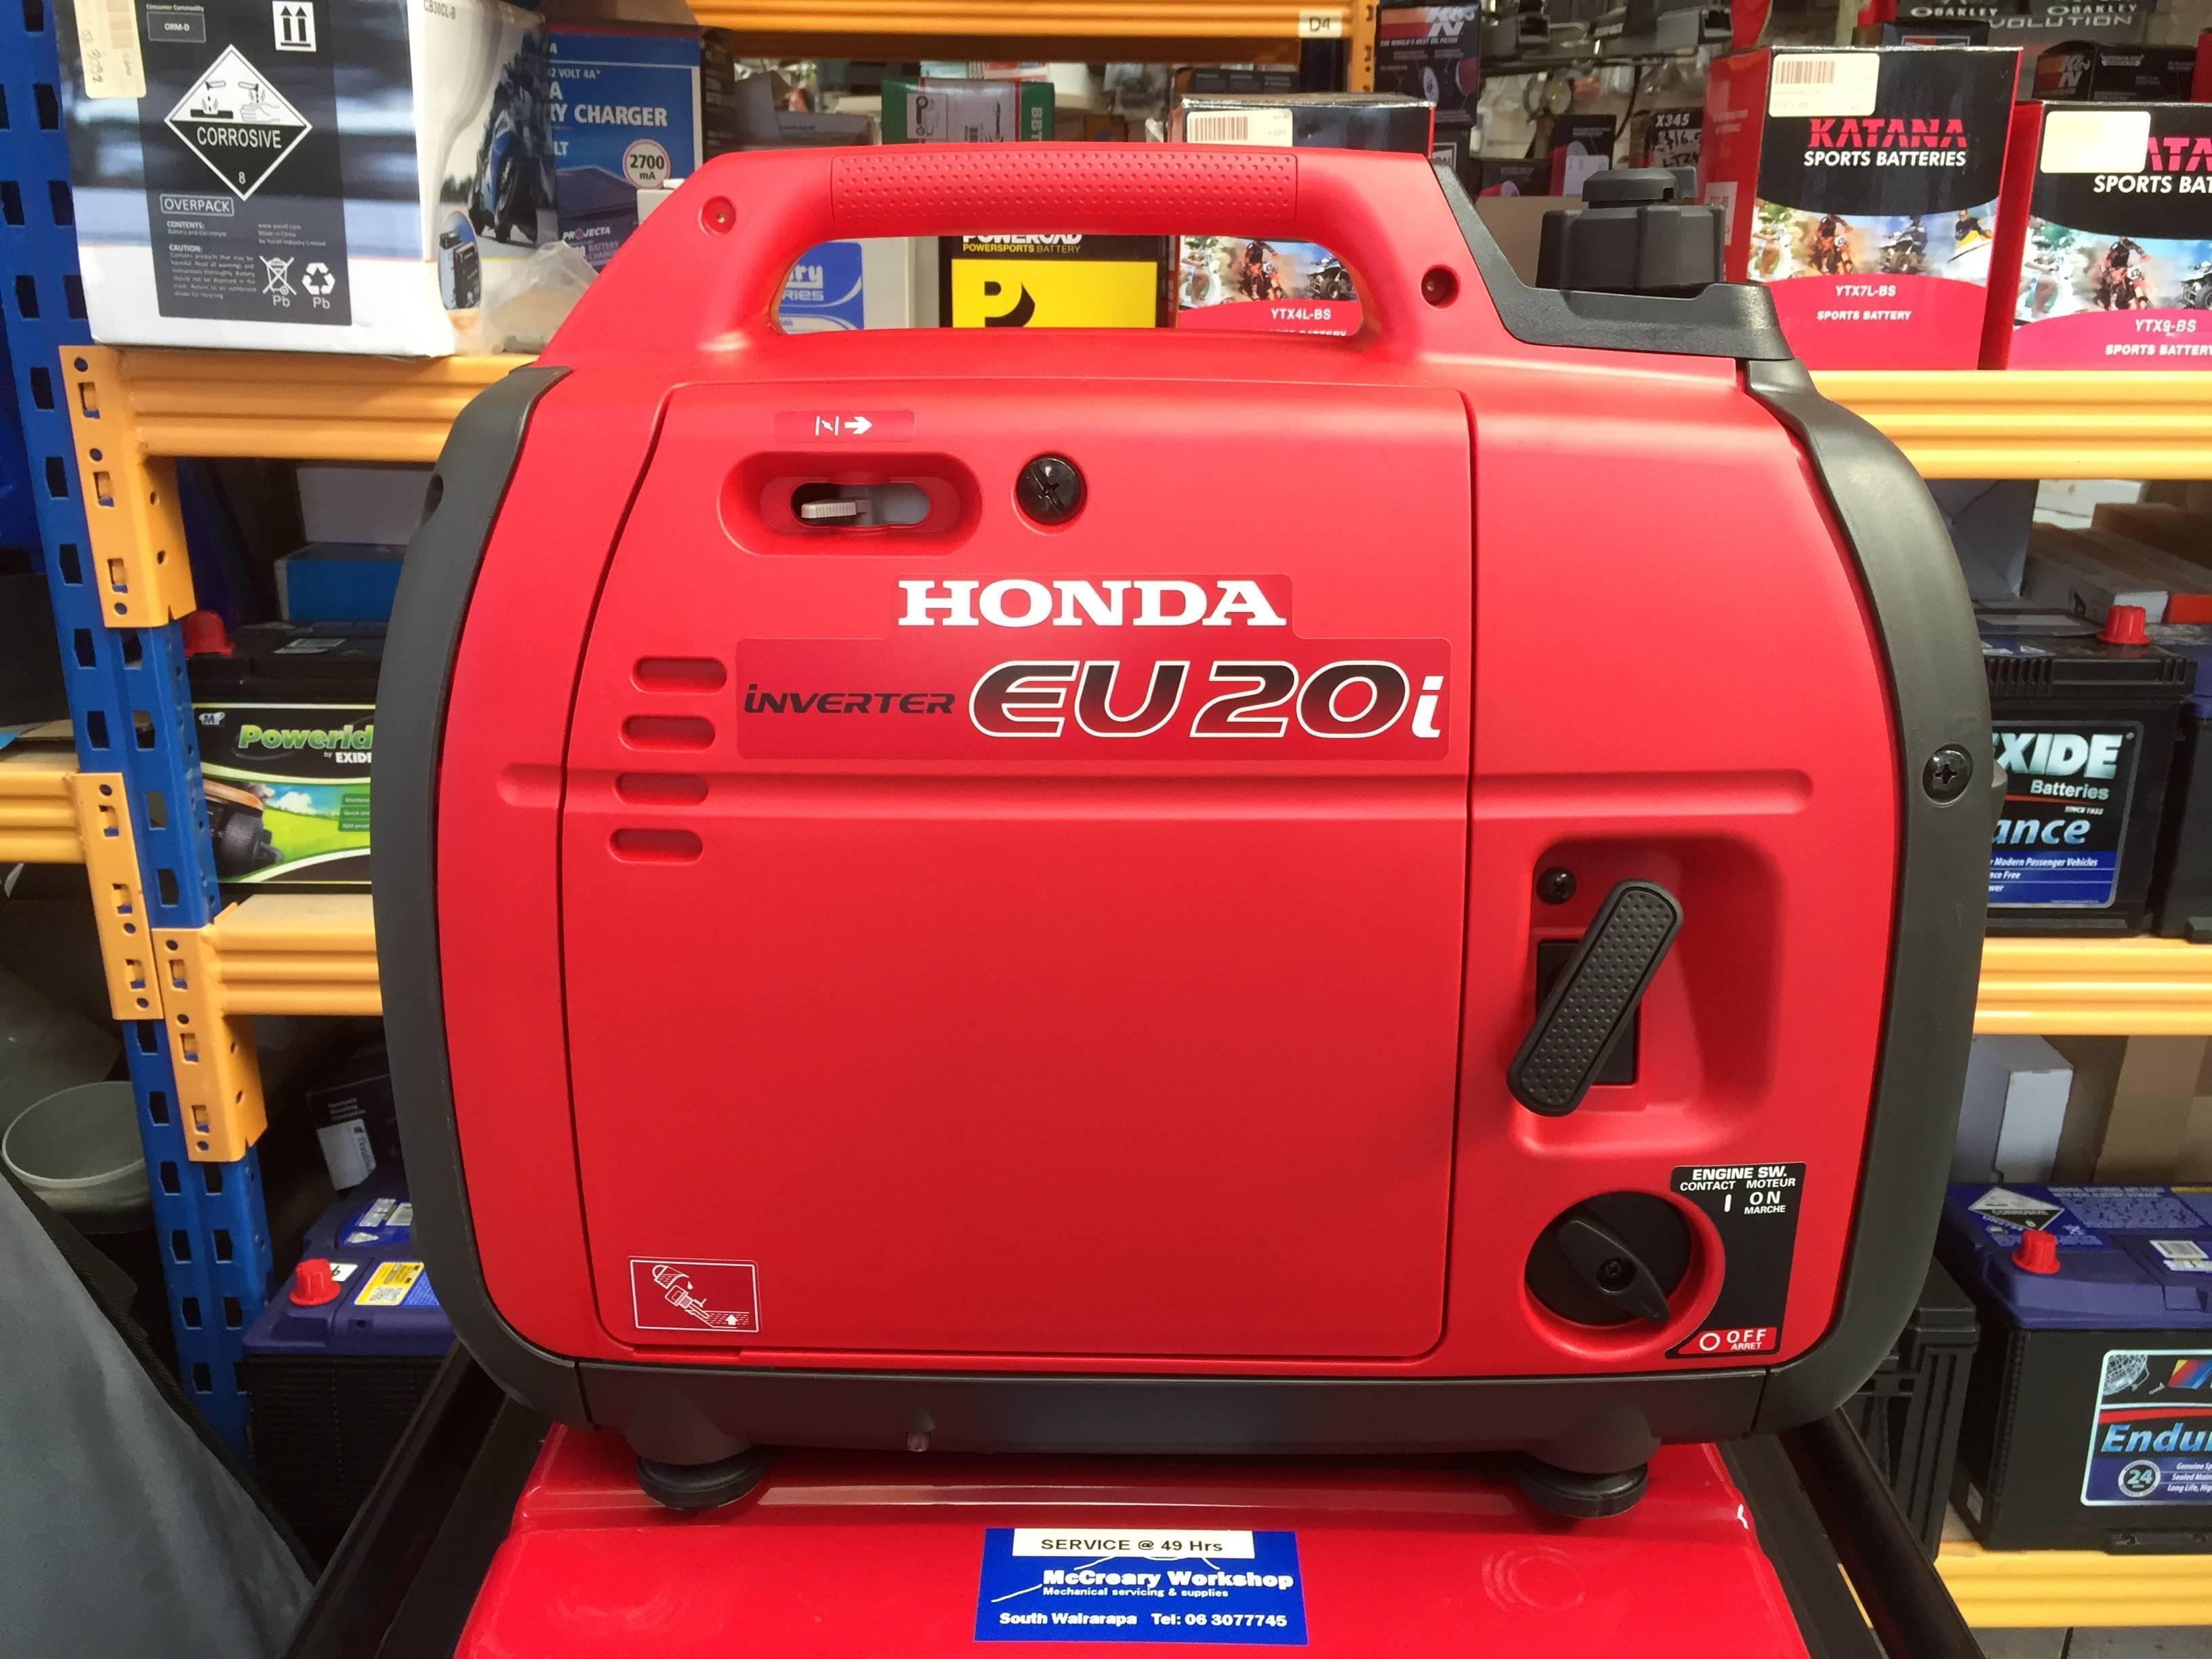 Honda Inverter EU20i Generator